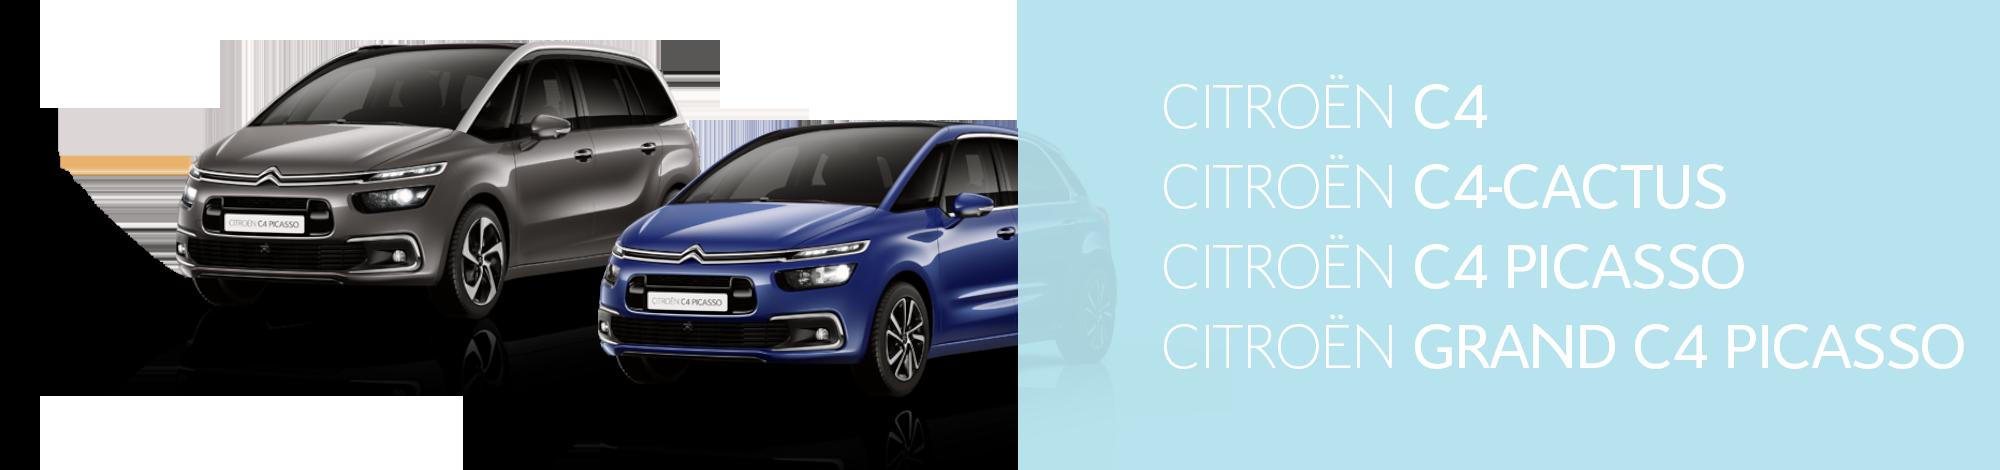 Citroën C4 Actie